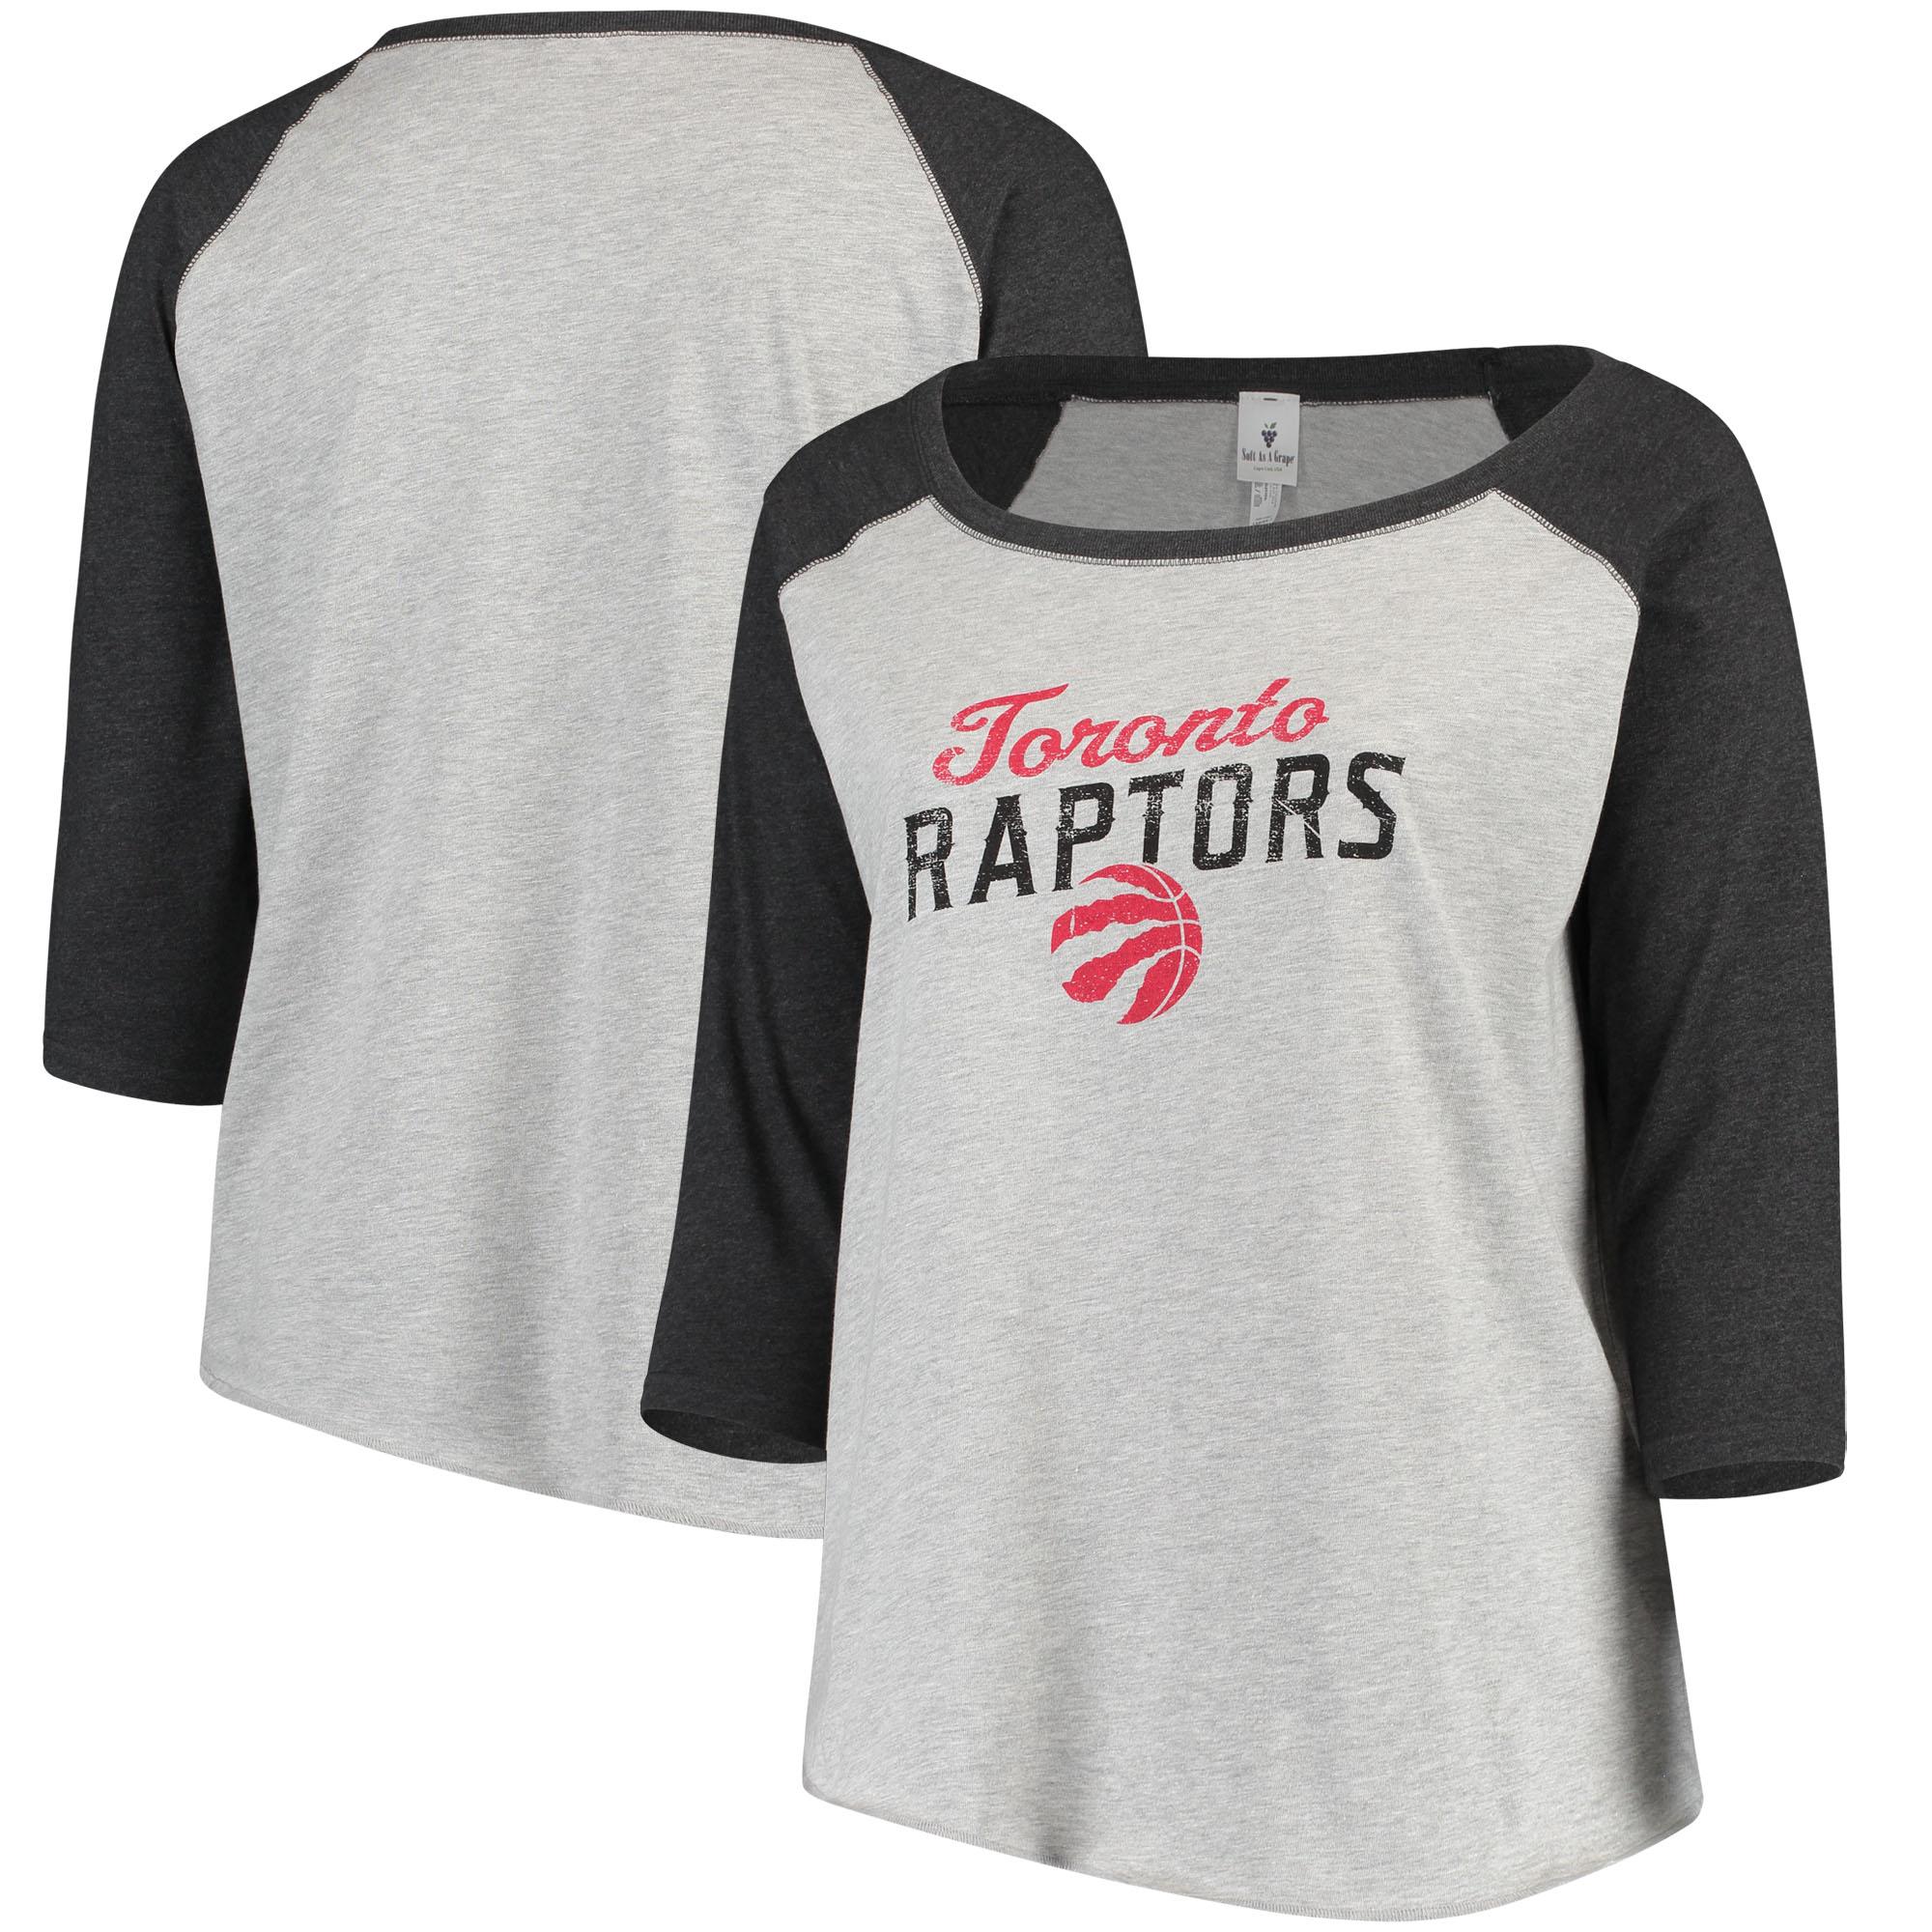 Toronto Raptors Soft as a Grape Women's Plus Size Raglan 3/4-Sleeve T-Shirt - Heathered Gray/Charcoal